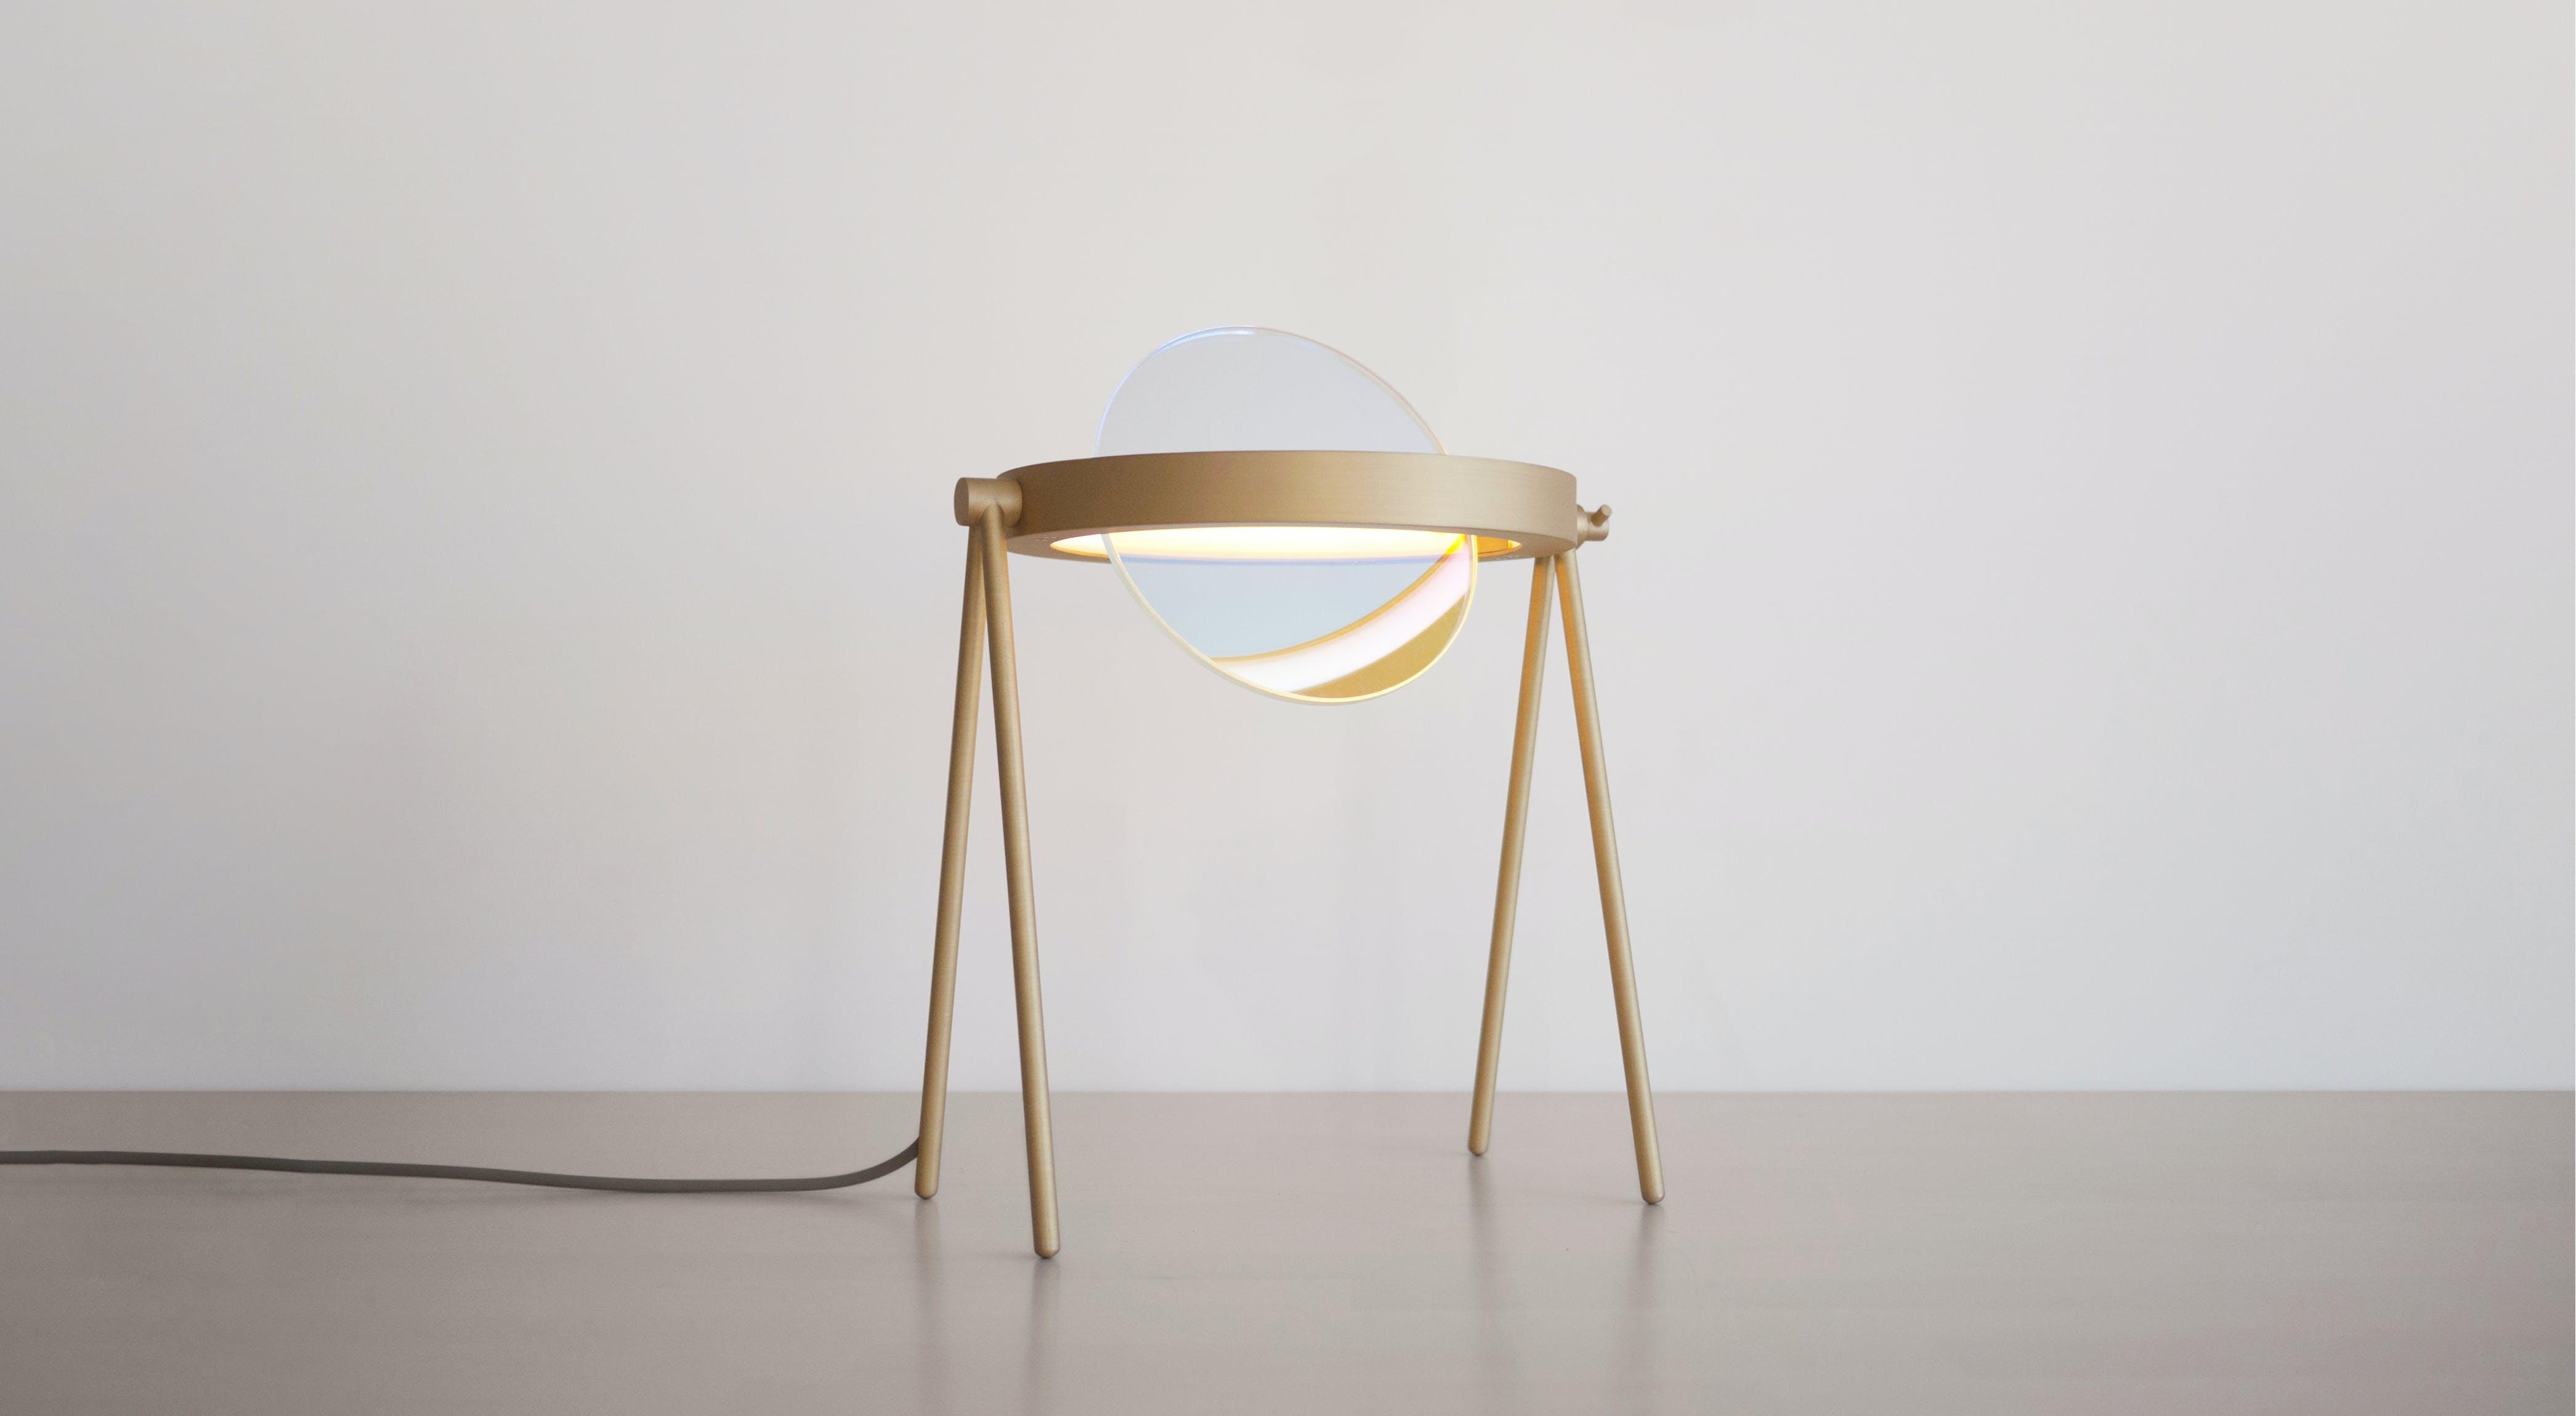 02 Janus Table Lamp Trueing